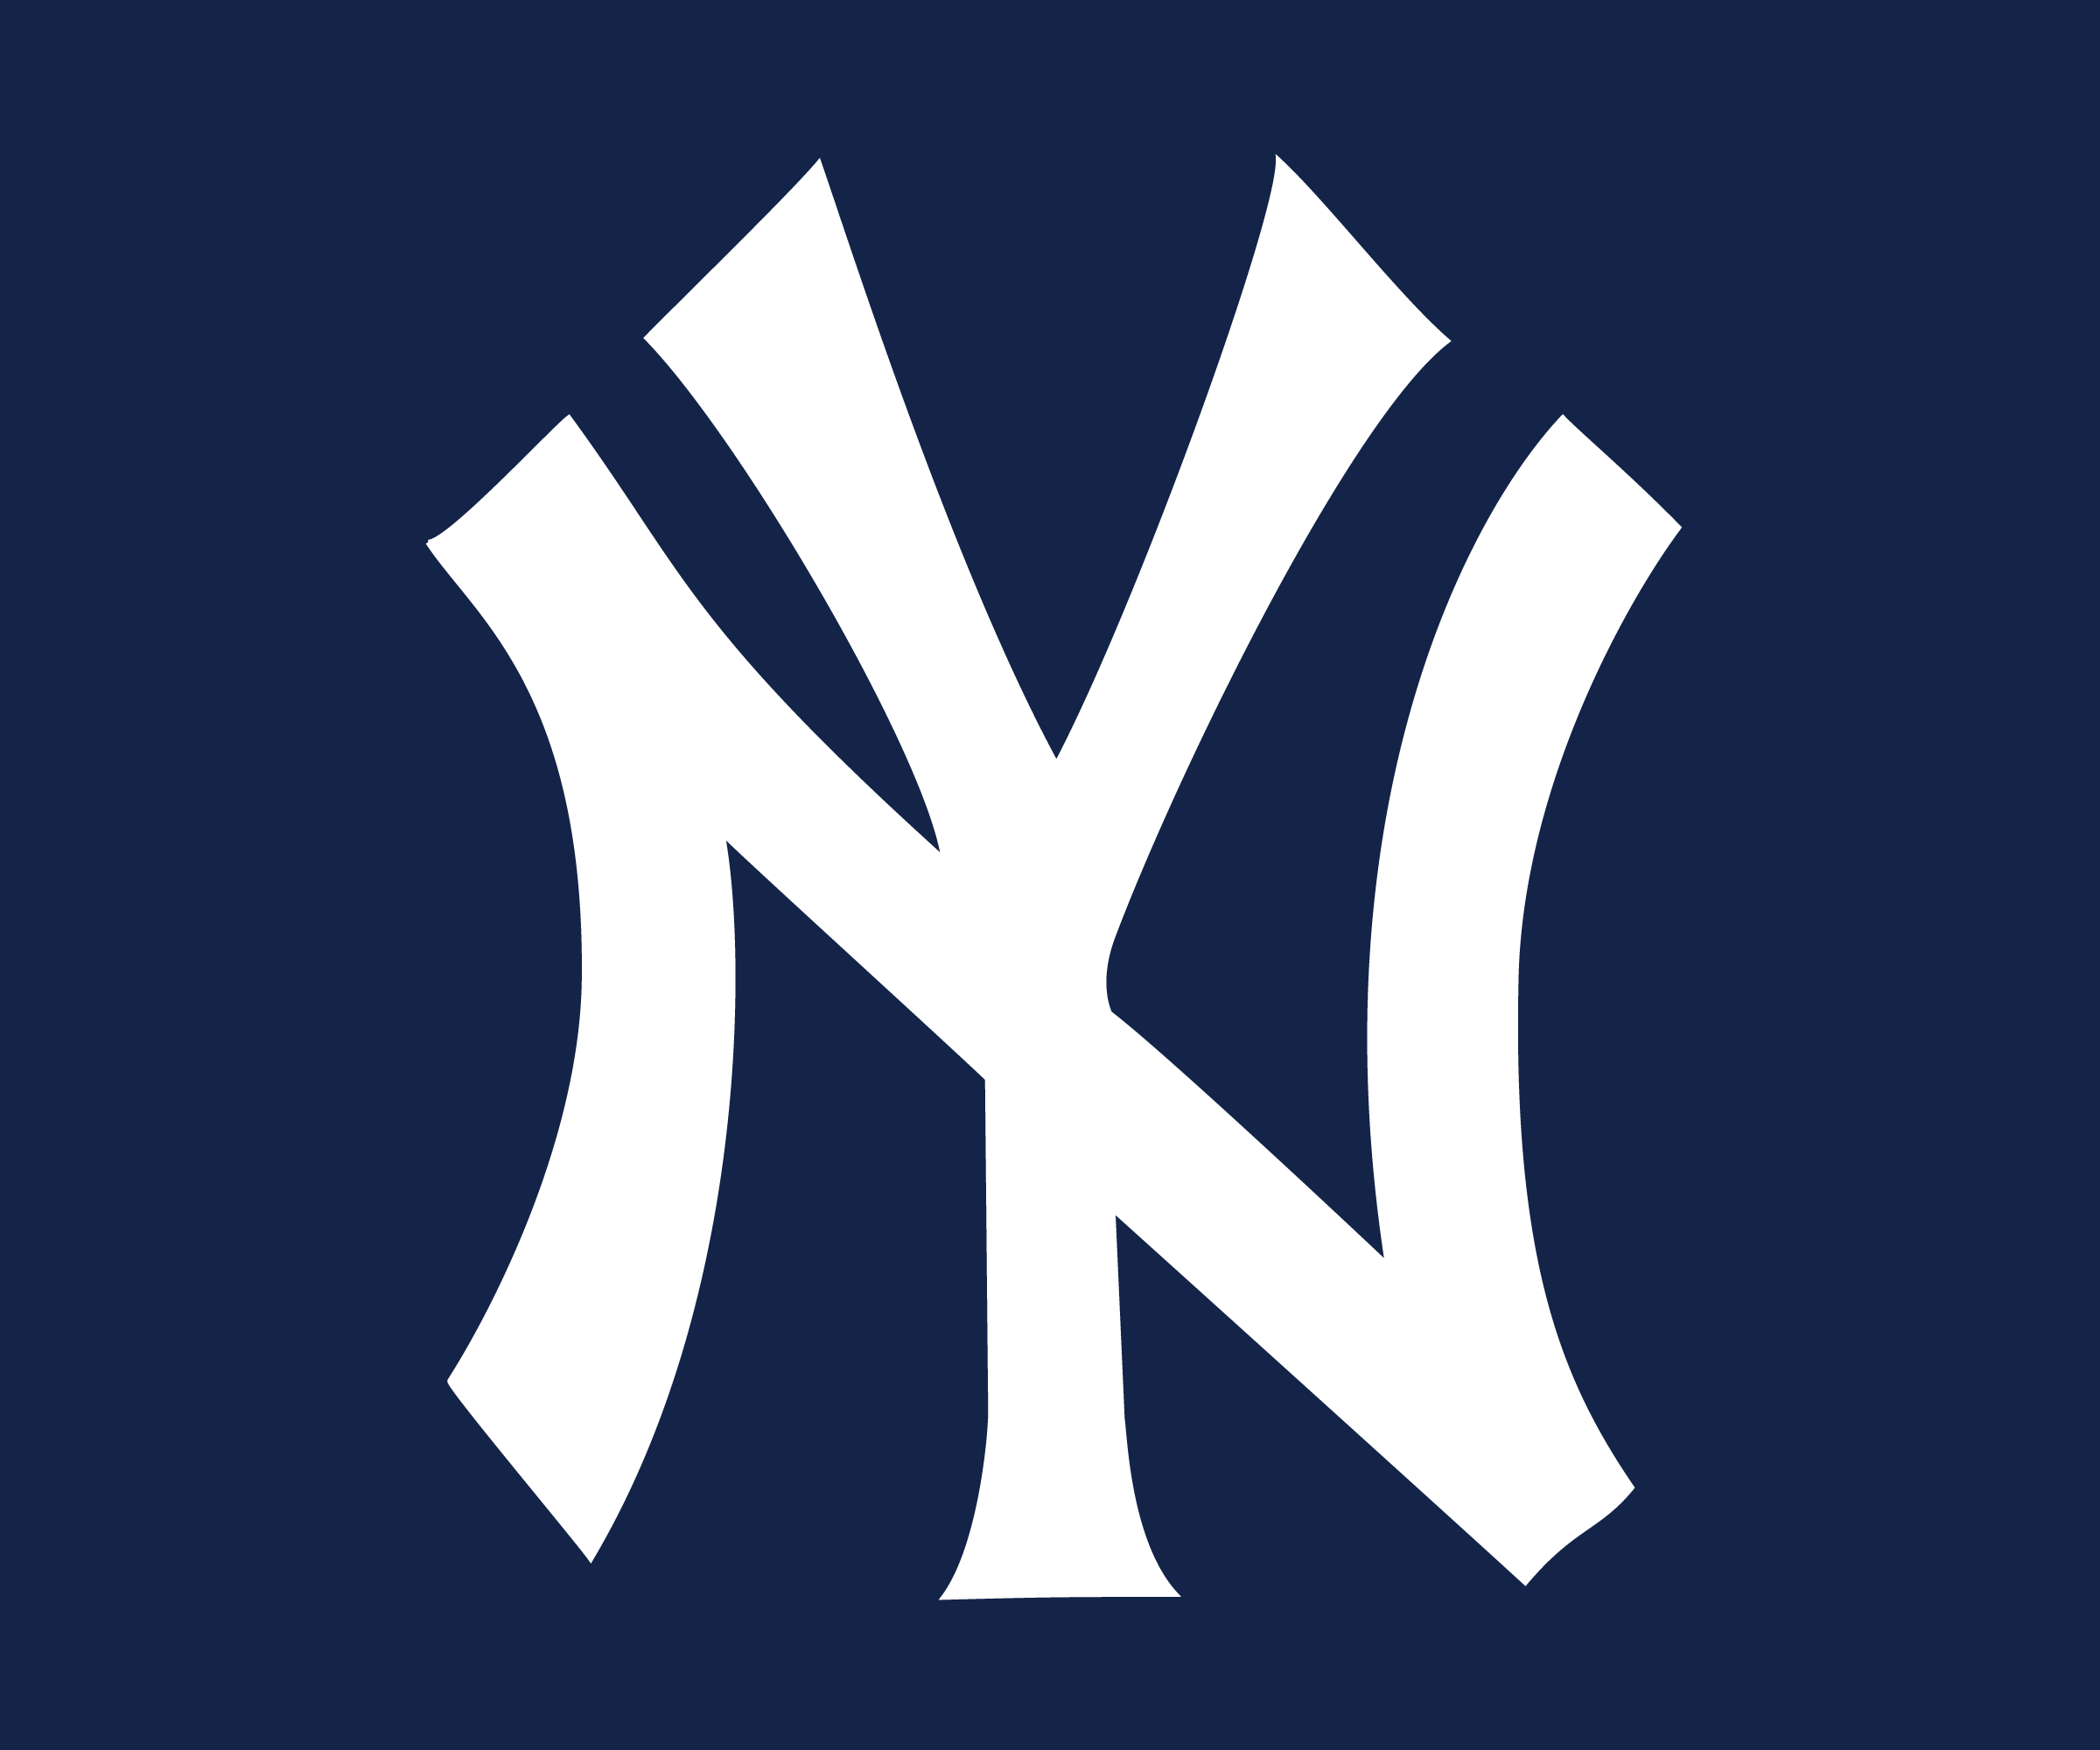 New York Yankees Ny Logo New York Yankees Logo Yankees Logo New York Yankees